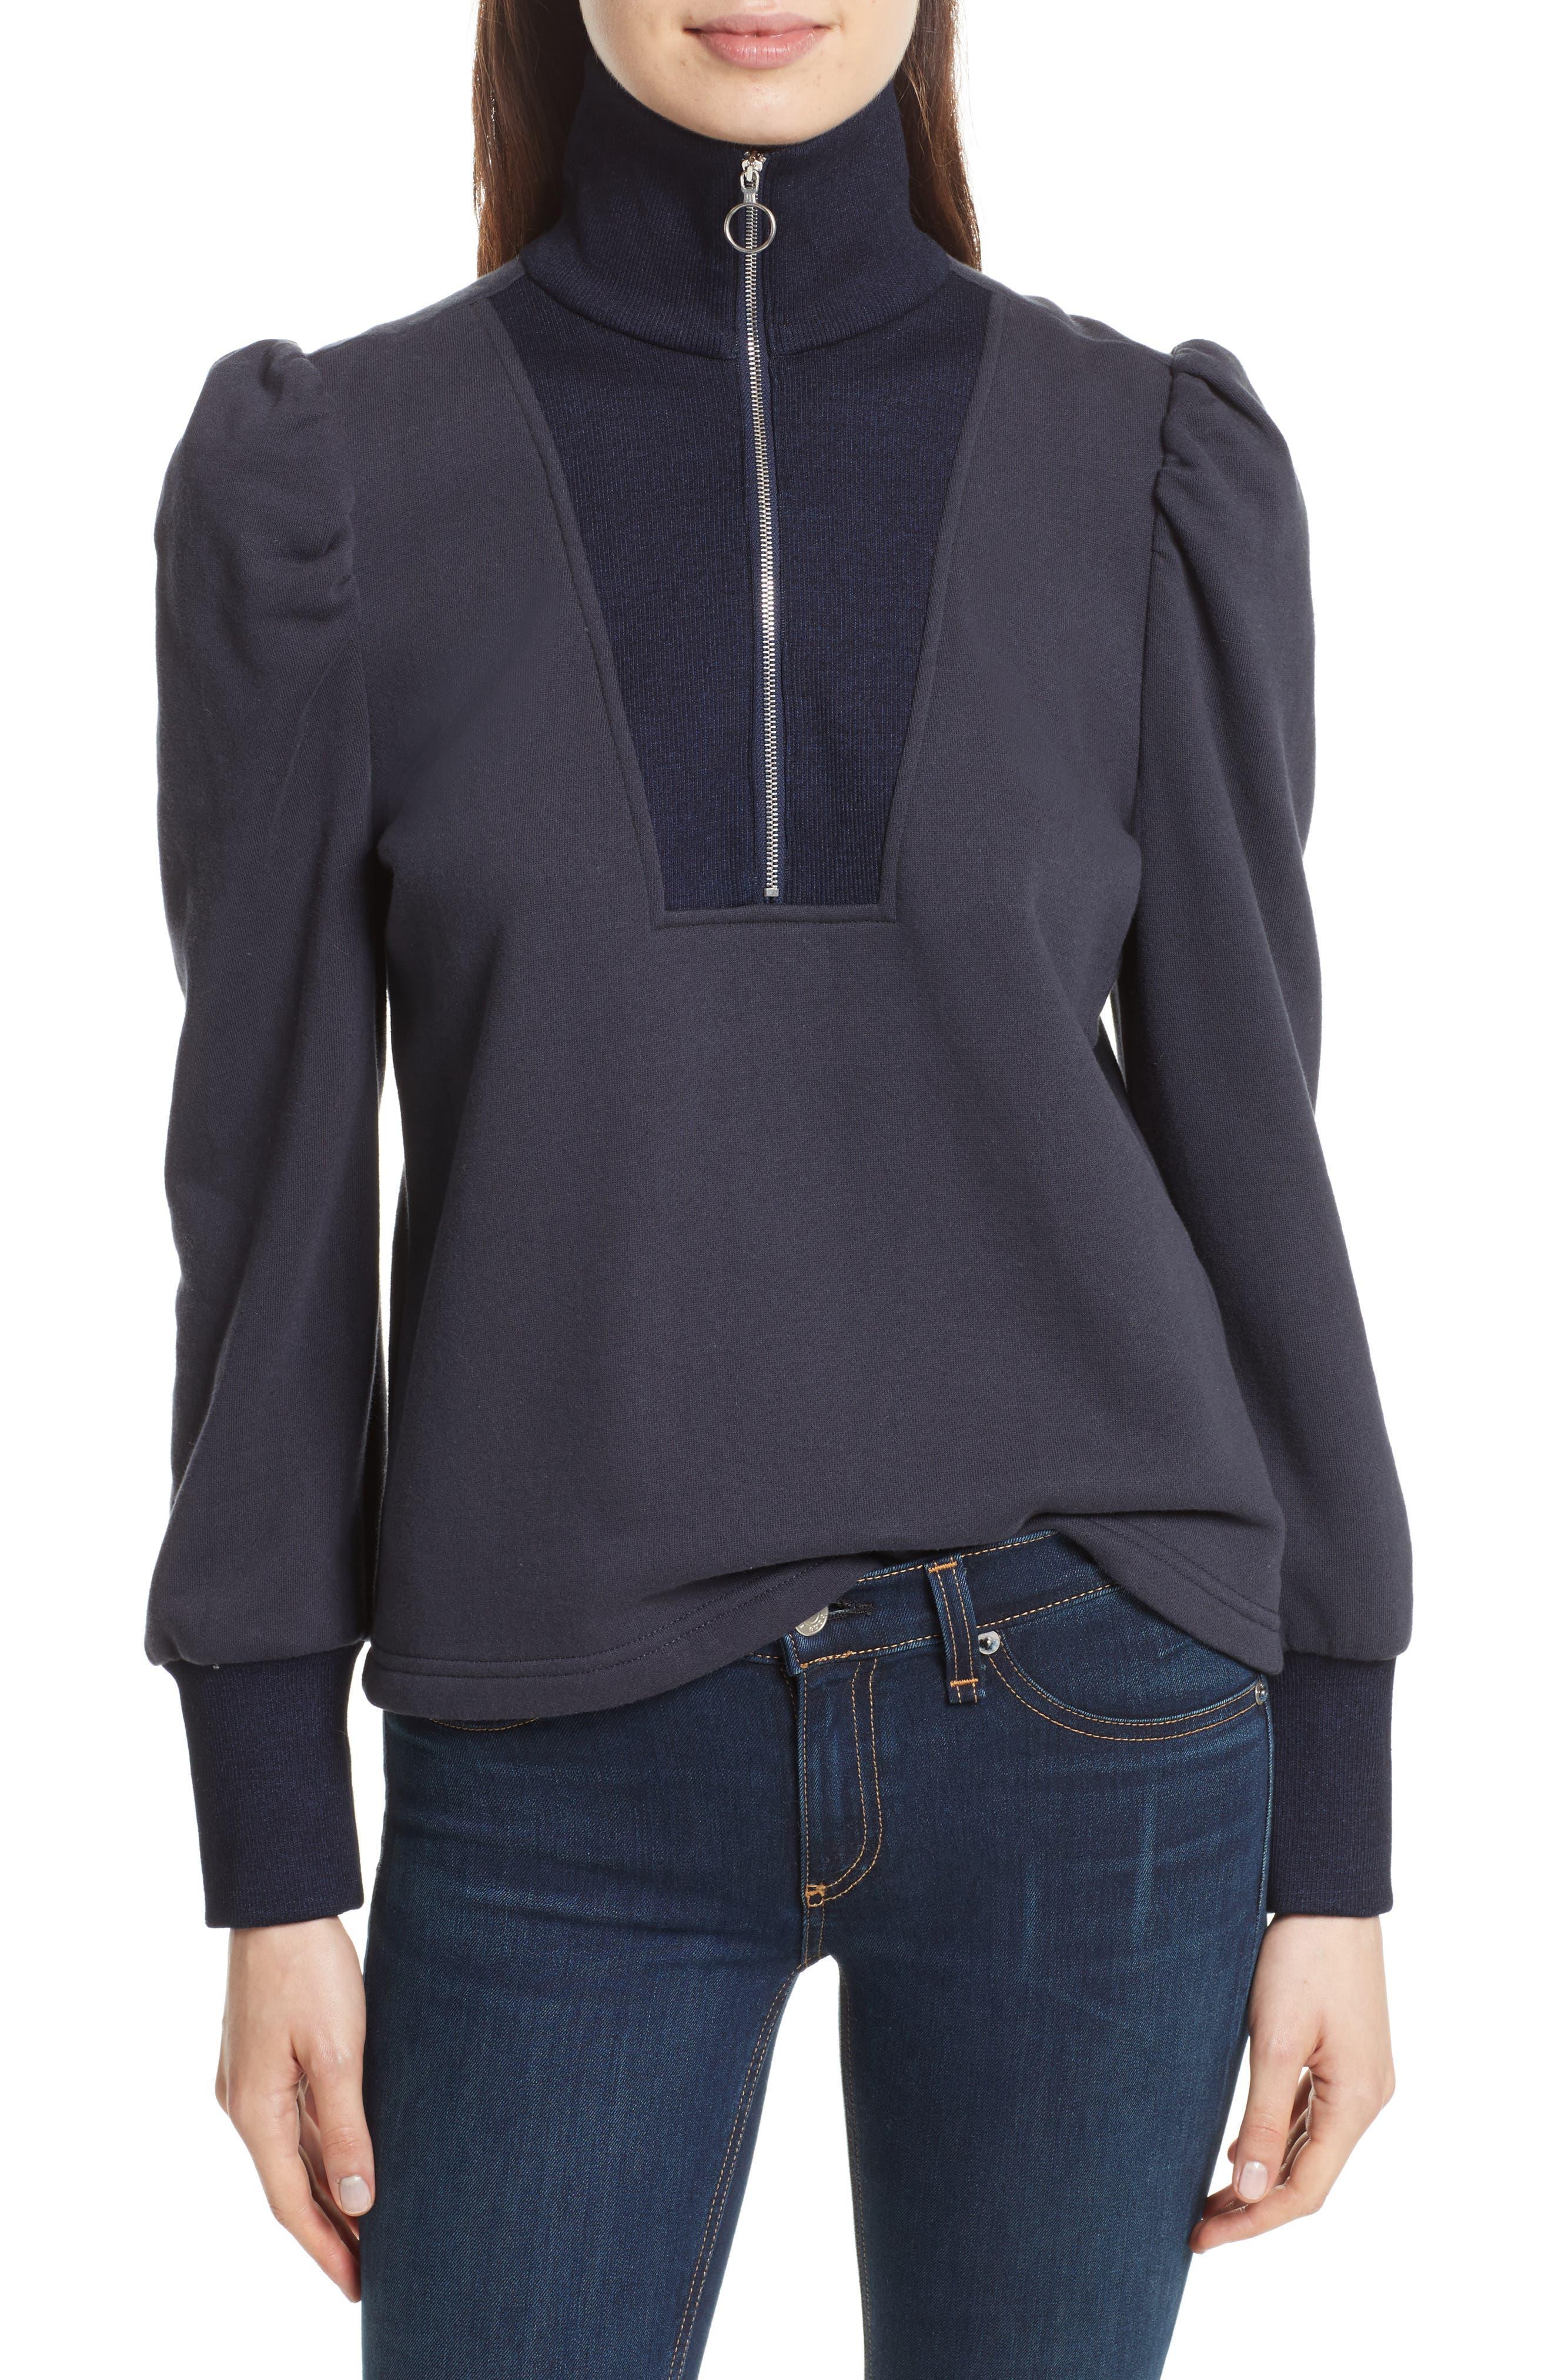 Alternate Image 1 Selected - Rebecca Taylor Turtleneck Fleece Zip Pullover